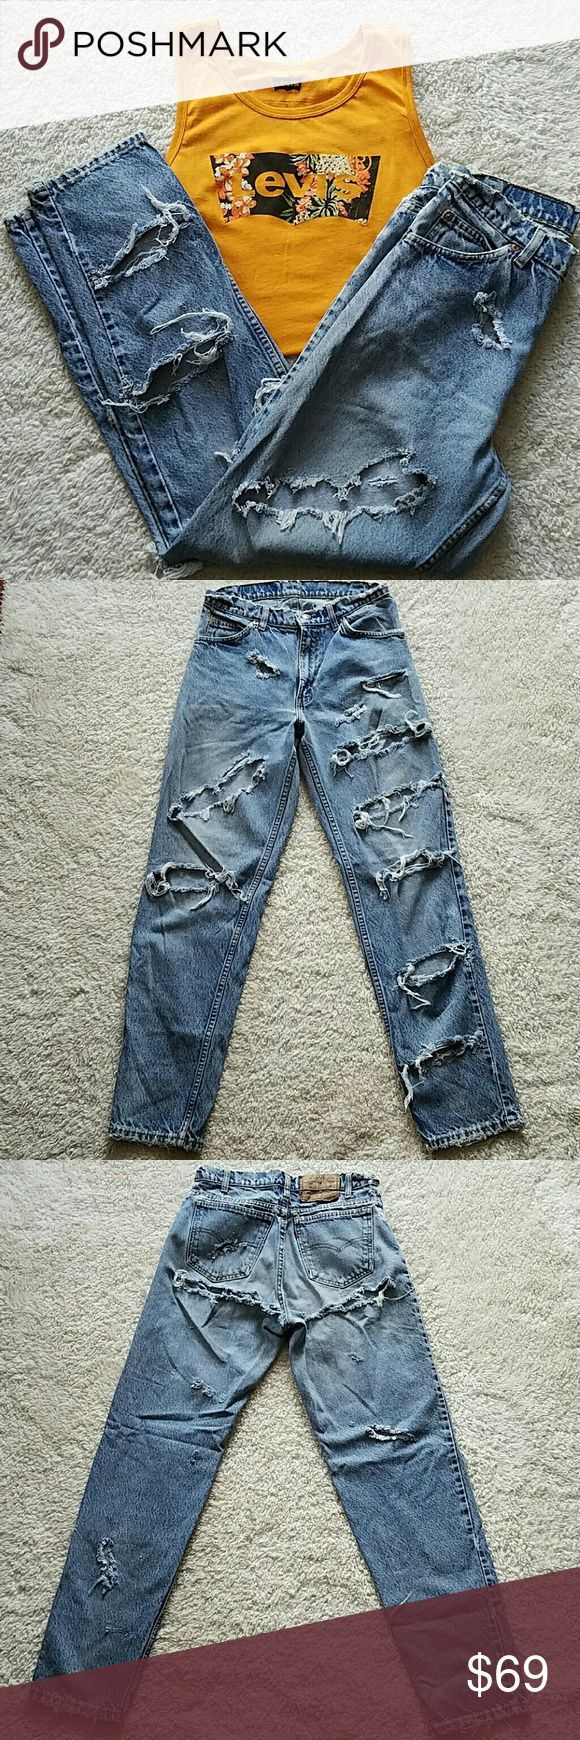 LEVI'S 550 DESTROYED JEANS~VINTAGE LEVI'S 550 DESTROYED JEANS ~VINTAGE BOTTOMS UP!! TAGGED: W30 L32 MEASURED: W28 1/4 L31 RISE: 11 Levi's Jeans